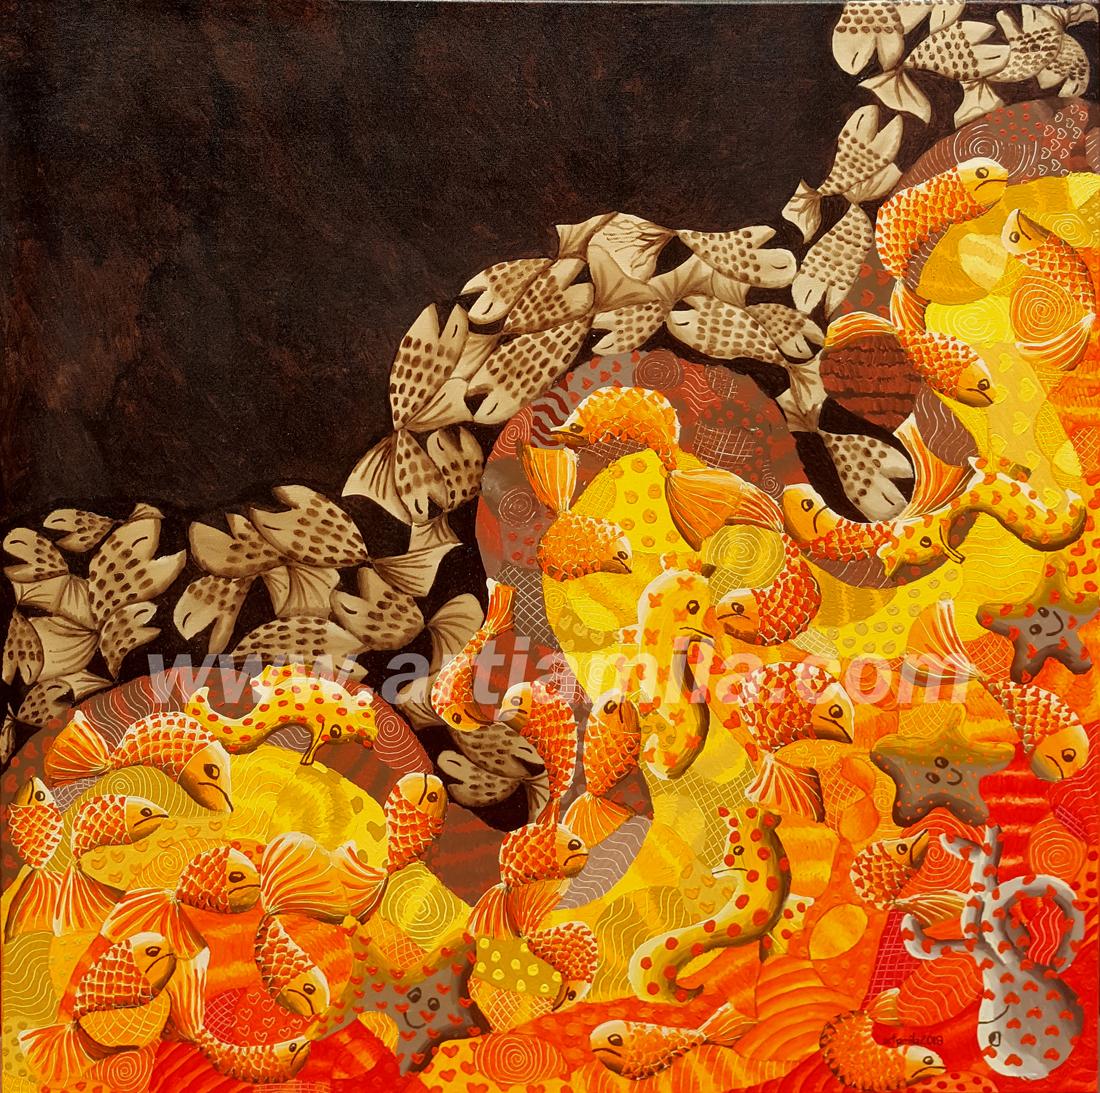 Fish Mosaic Oil Pollution Series 2. Watermark